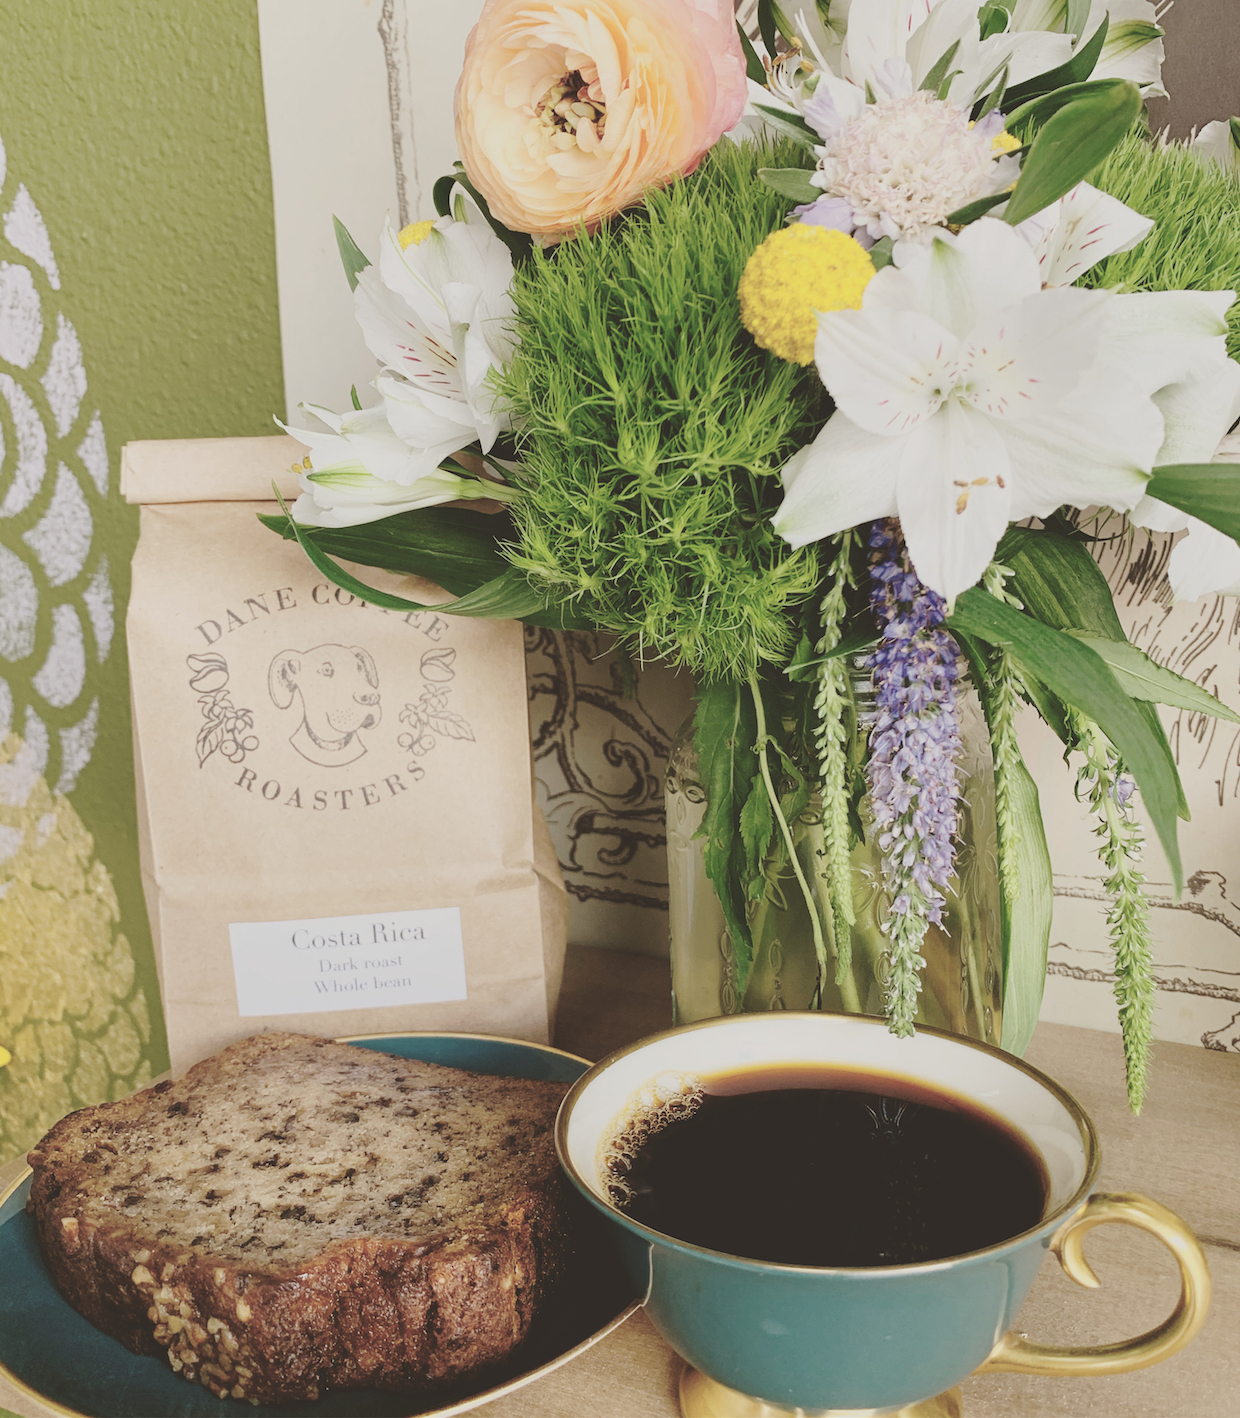 Dane Coffee Roasters 3